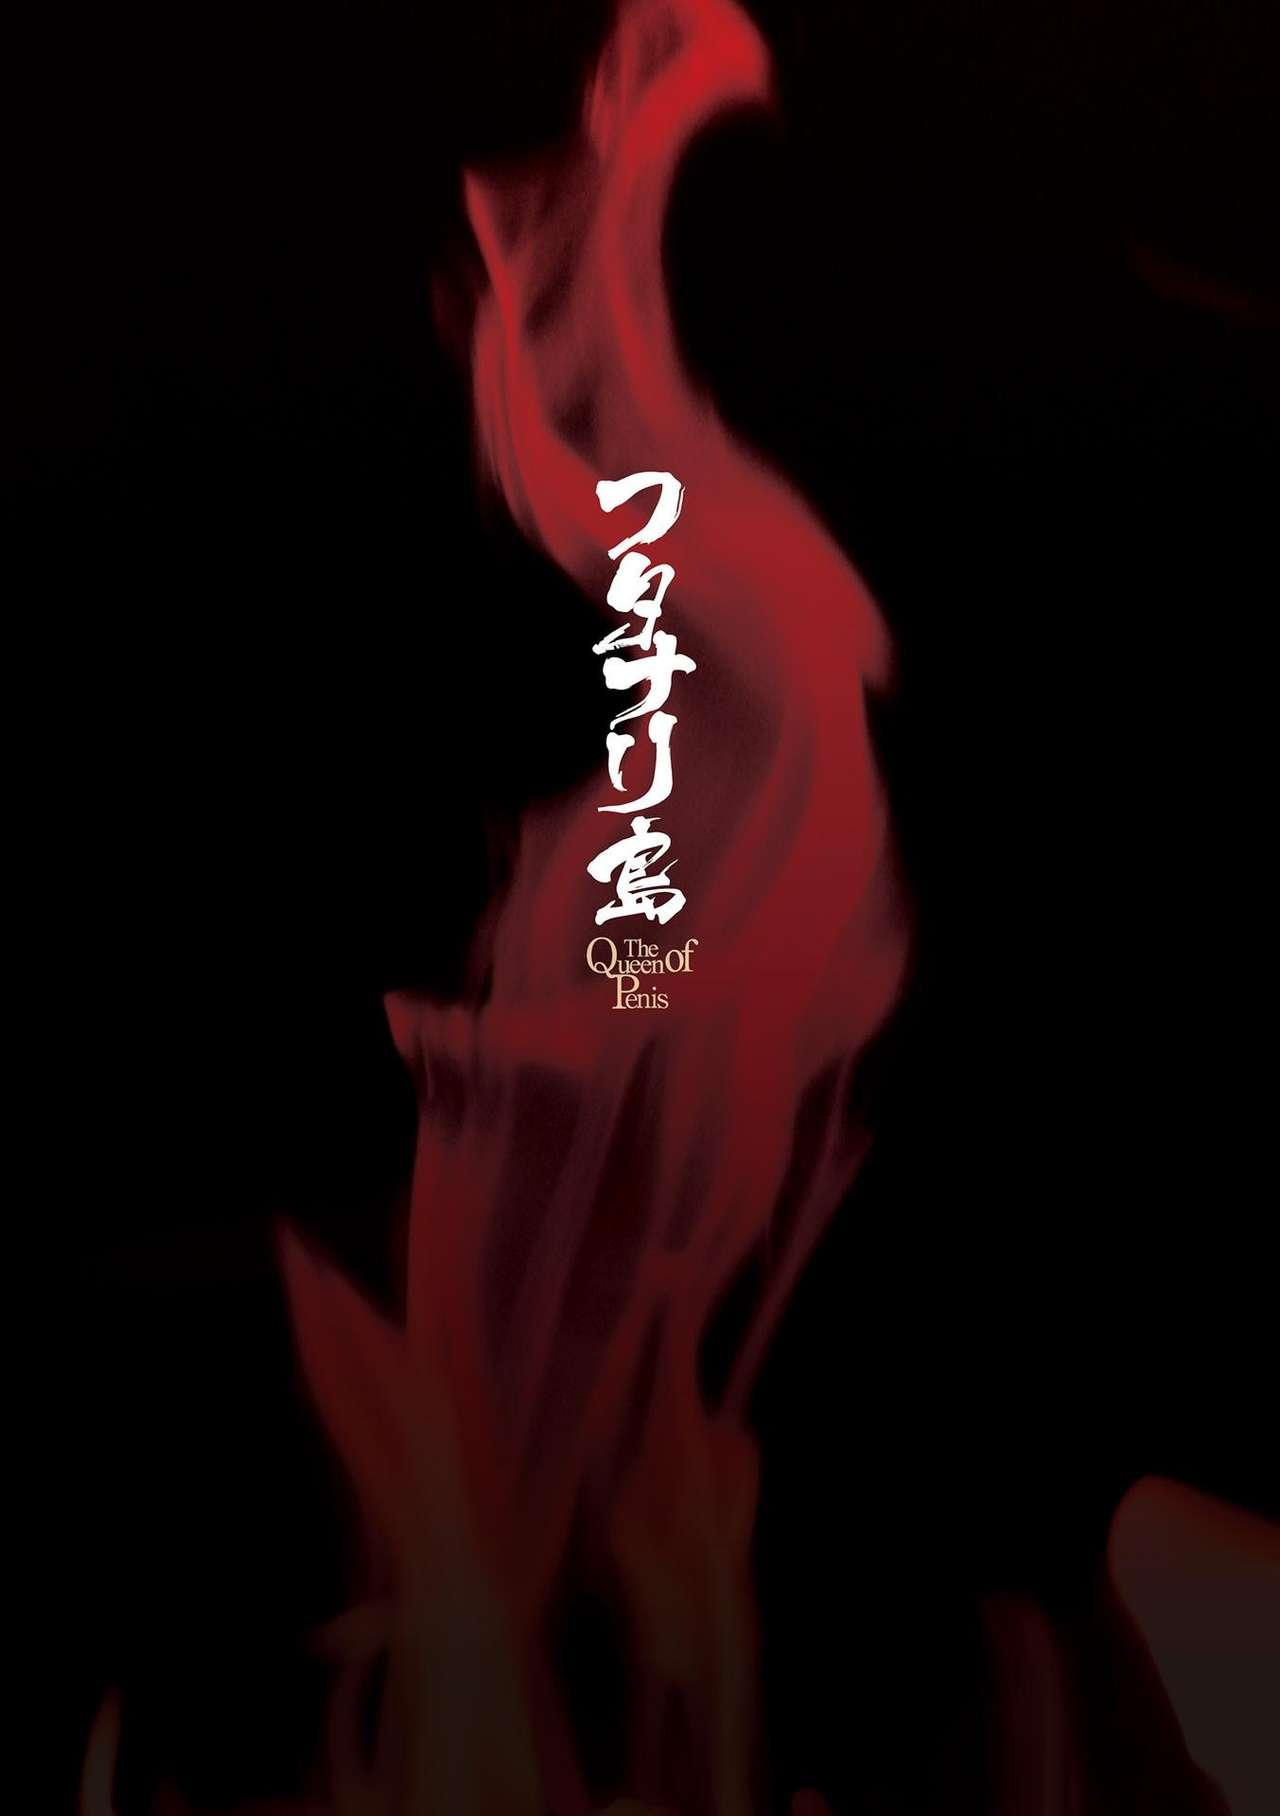 [Kaguya] Futanarijima ~The Queen of Penis~ Ch. 4 [Chinese] [黄记汉化组] 2